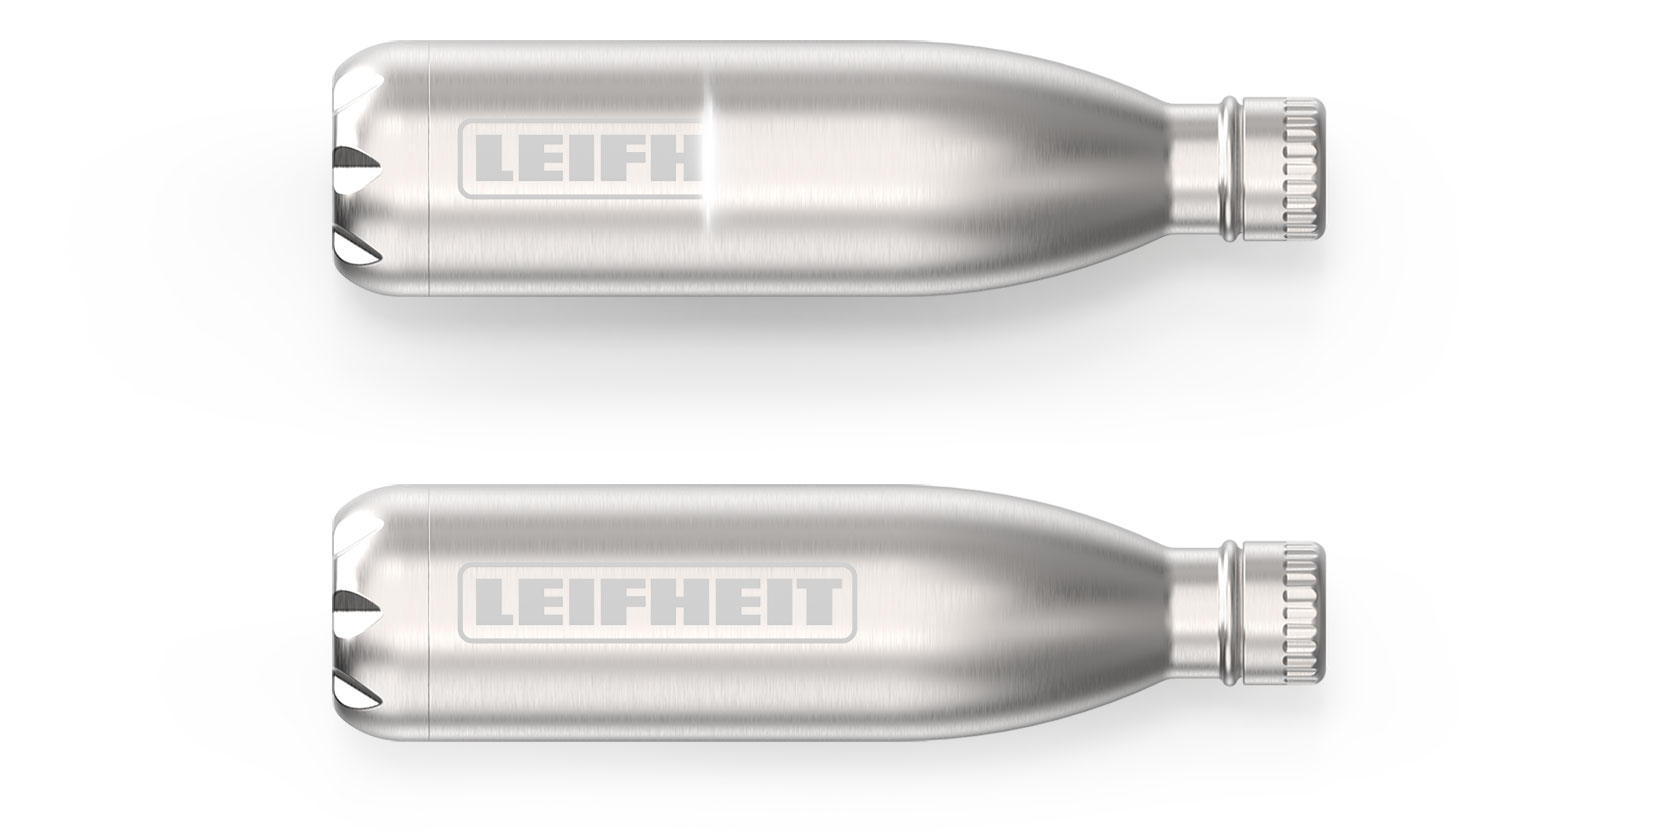 Flasky - Laser Engraving